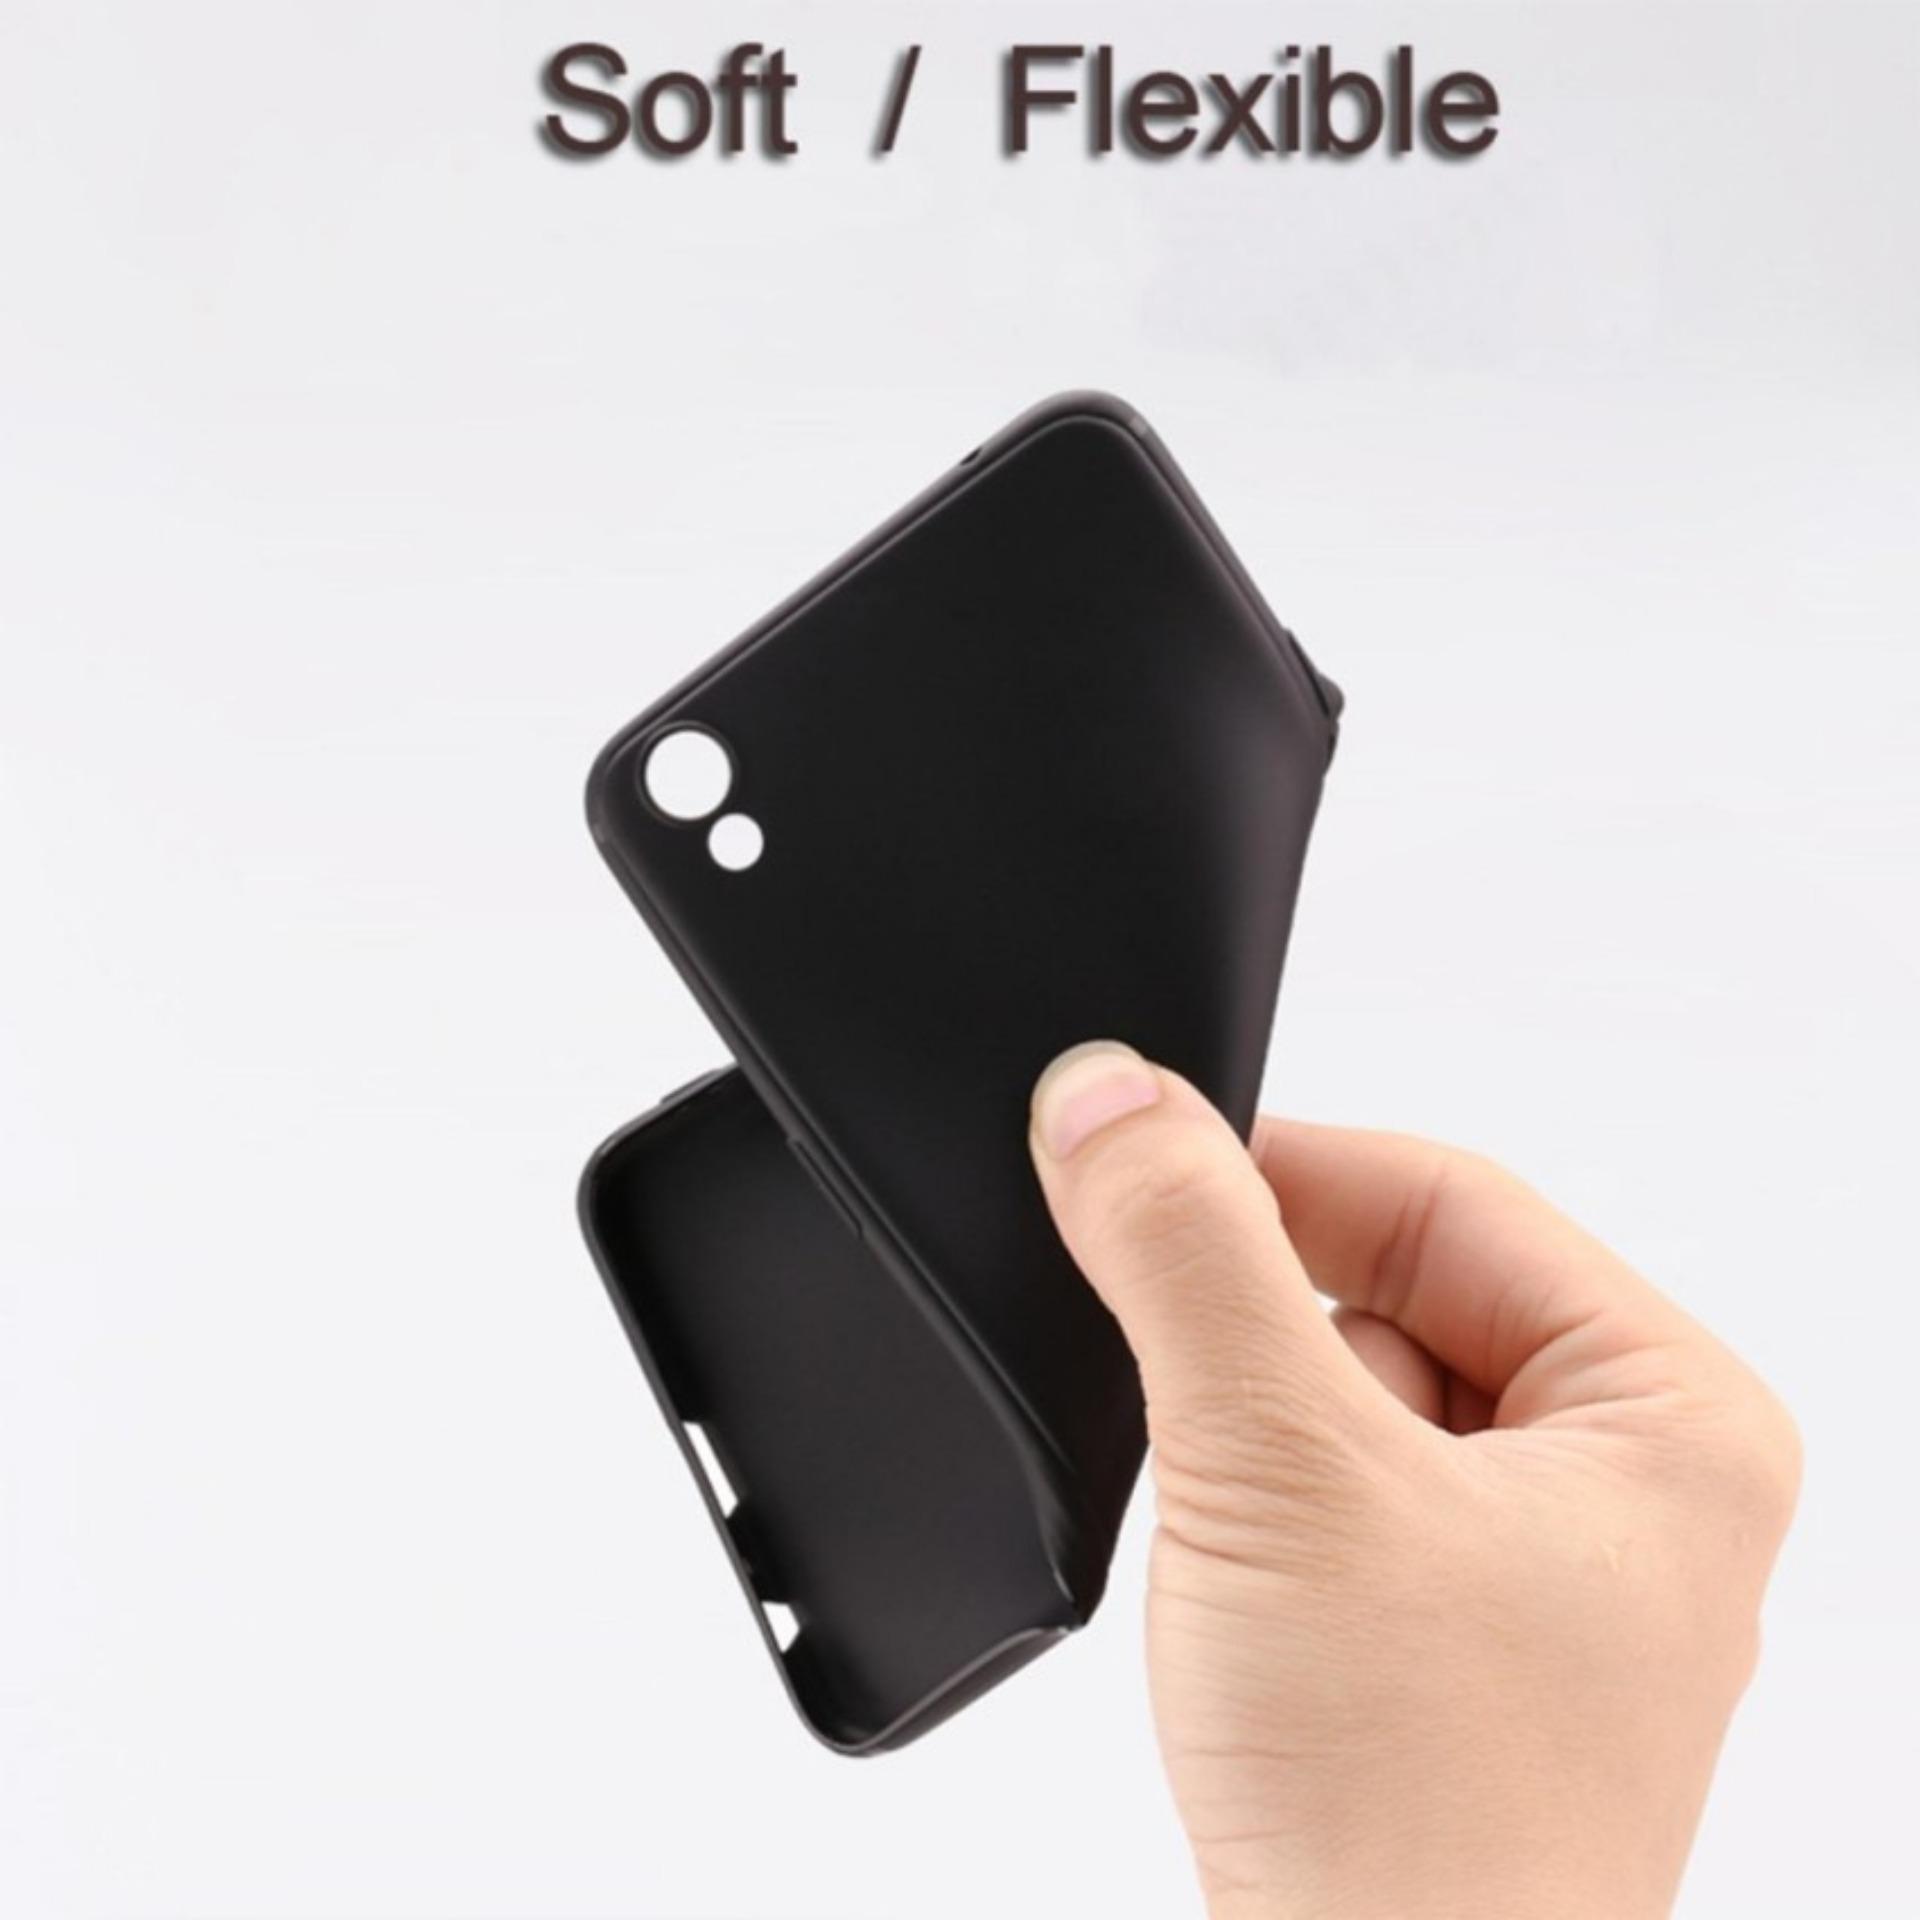 ... Case Slim Black Matte Oppo R9 / F1 Plus Baby Skin Softcase Ultra Thin Jelly Silikon